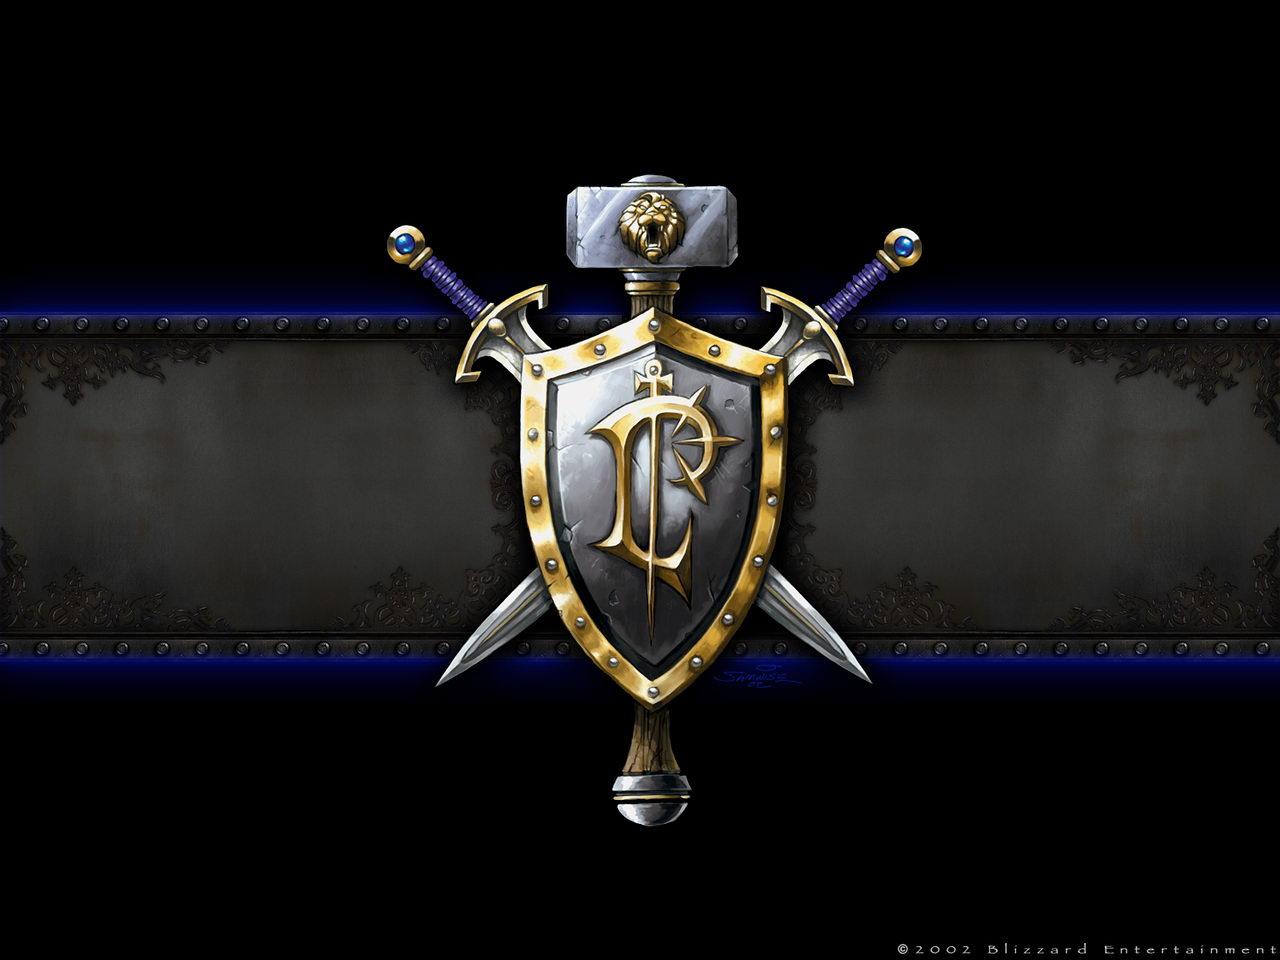 Human Shield  Warcraft 3 Reign of Chaos Wallpaper Gallery   Best 1280x960